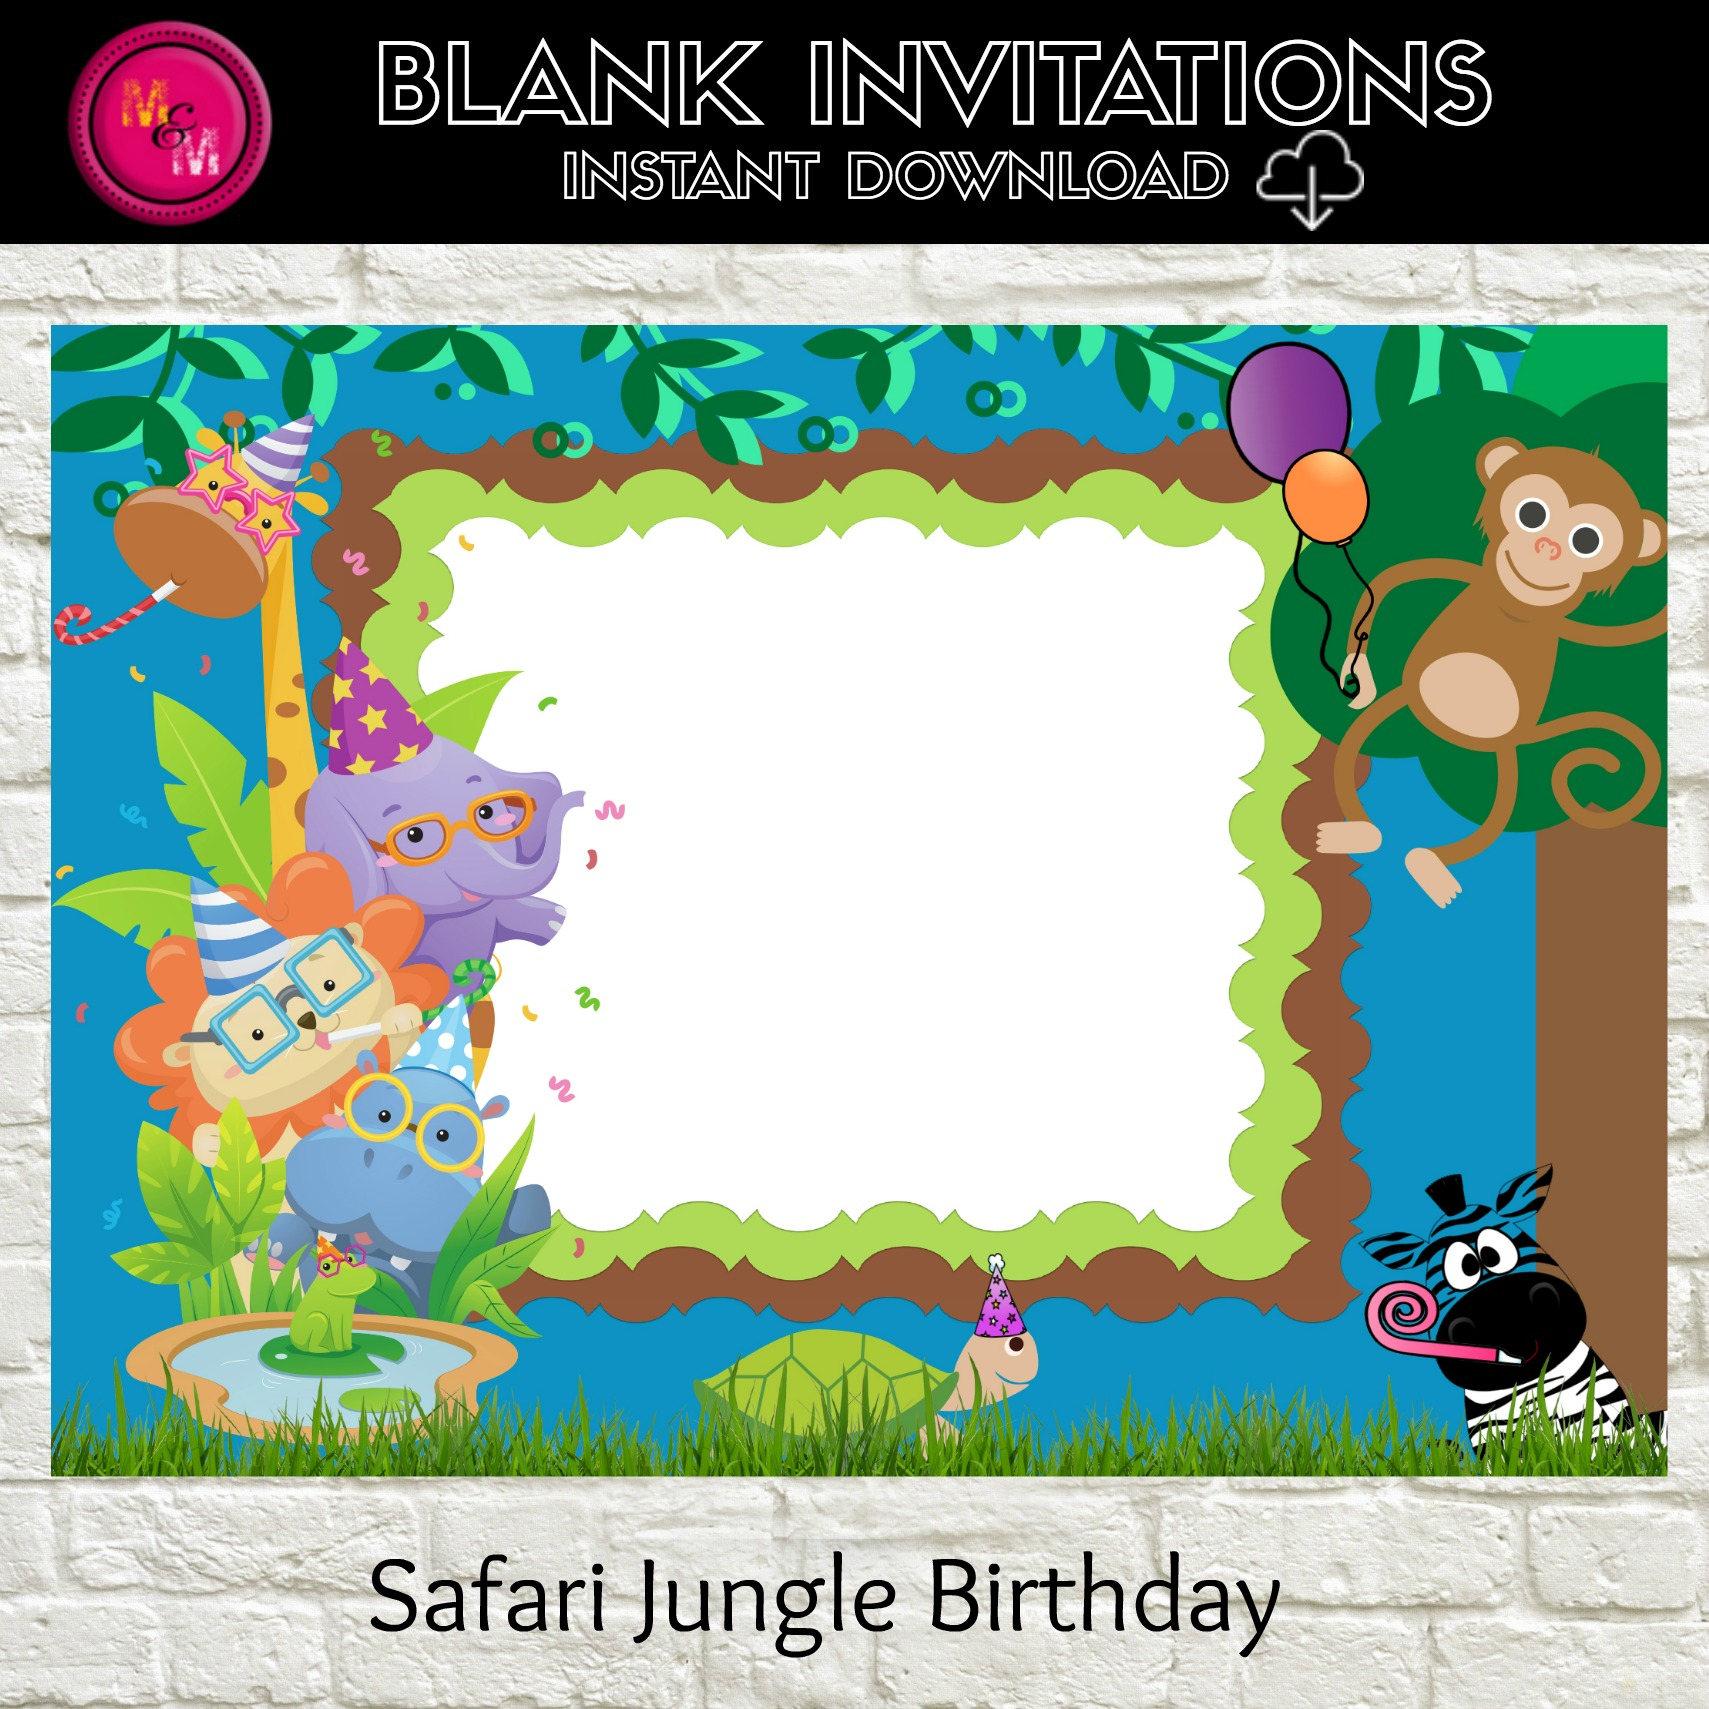 Safari Jungle Birthday Invitation Blank-Instant Download | Etsy